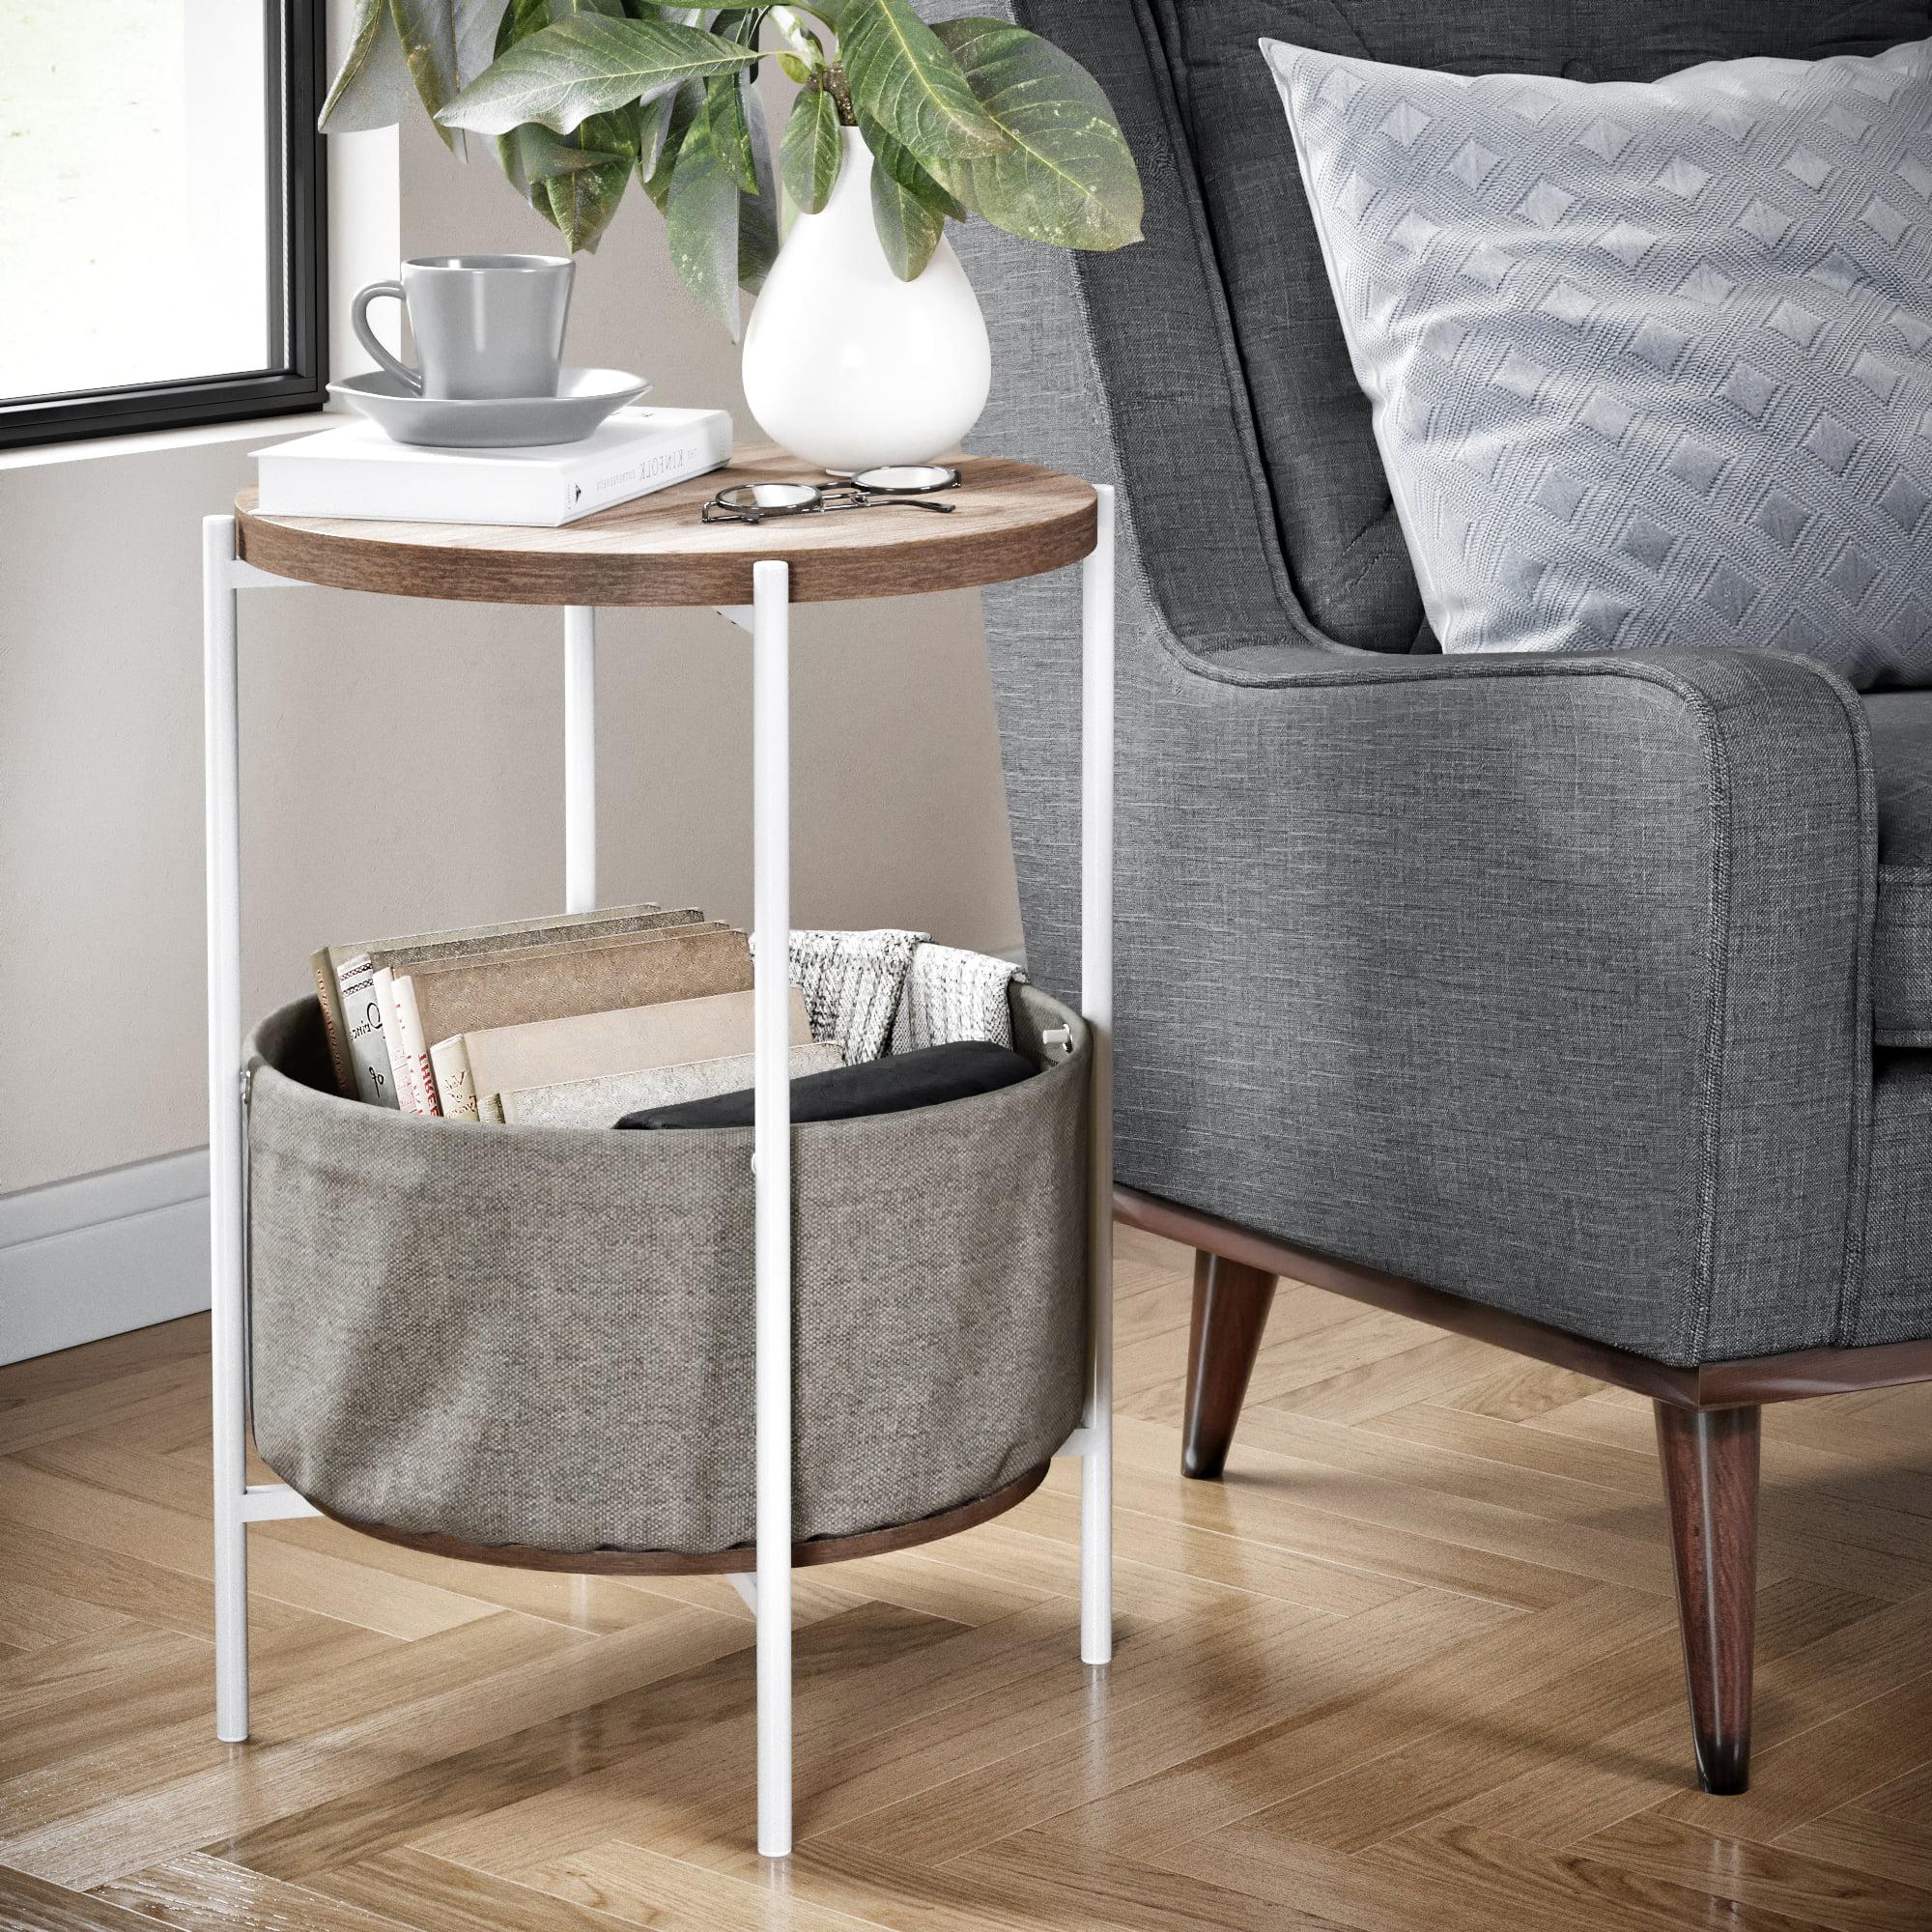 Nathan James Oraa Wood Side Table With Beige Fabric Storage Light Brown Top White Metal Base Walmart Com Walmart Com